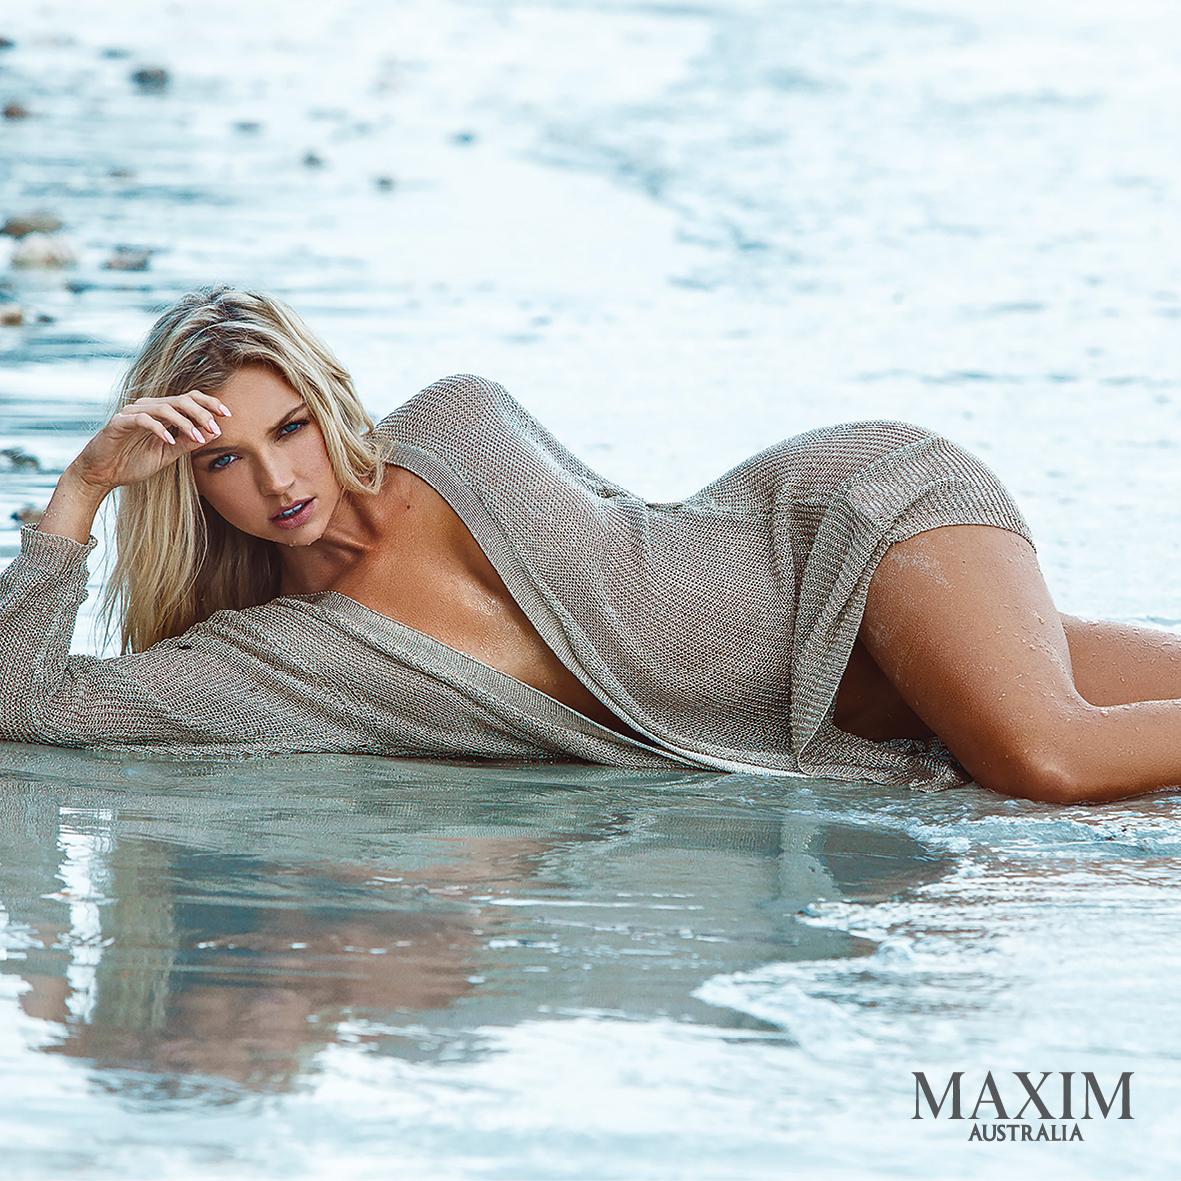 Maxim-New-Zealand-Alison-Bowles-6